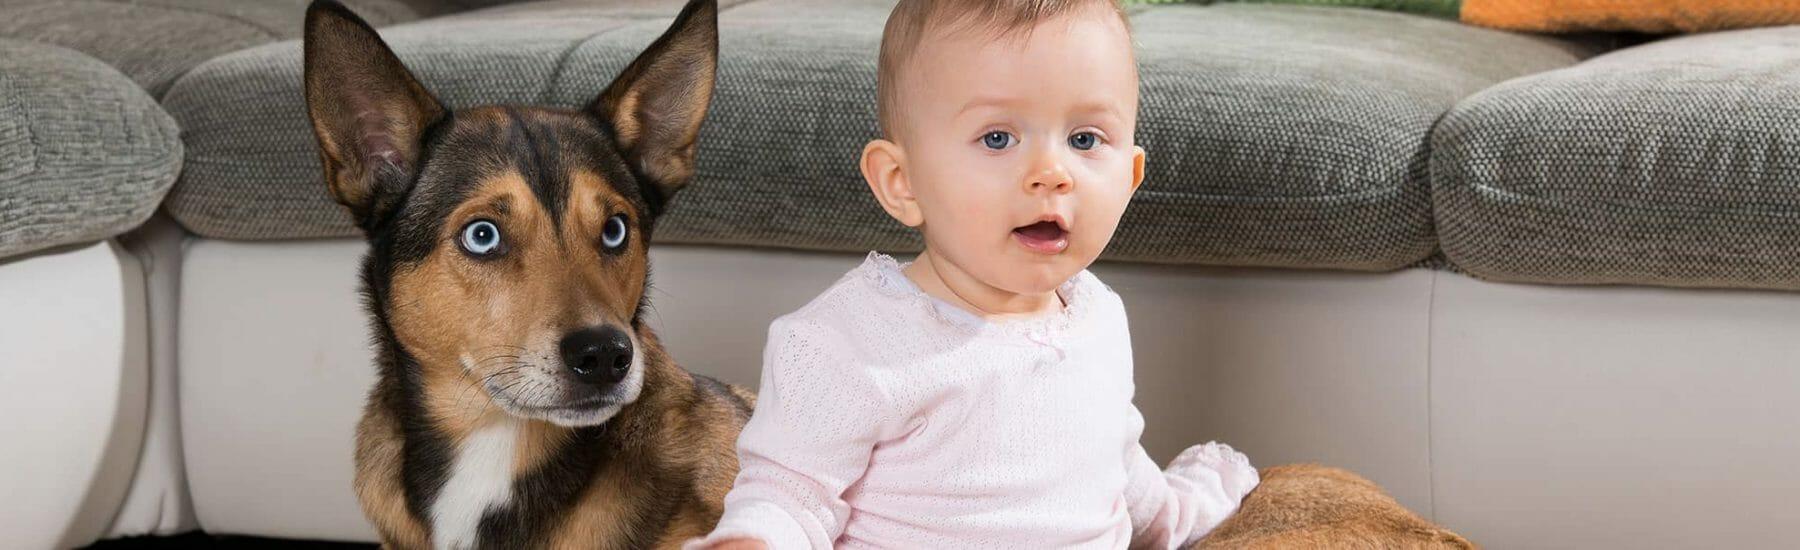 Dog and baby looking towards camera